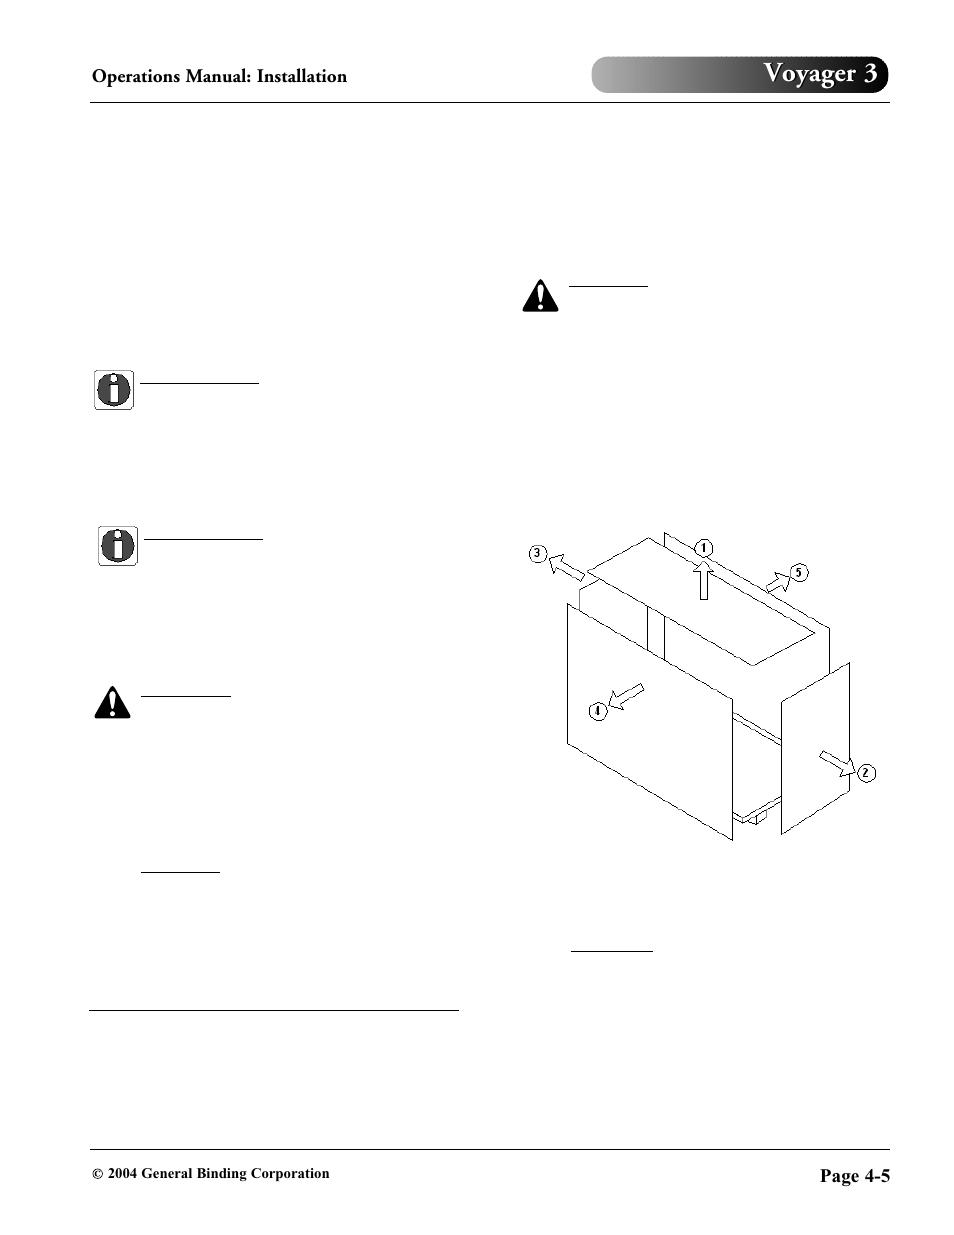 Voyager 3 Parts Manual Gbc Wiring Diagram Array 930 032 User Page 29 34 Rh Manualsdir